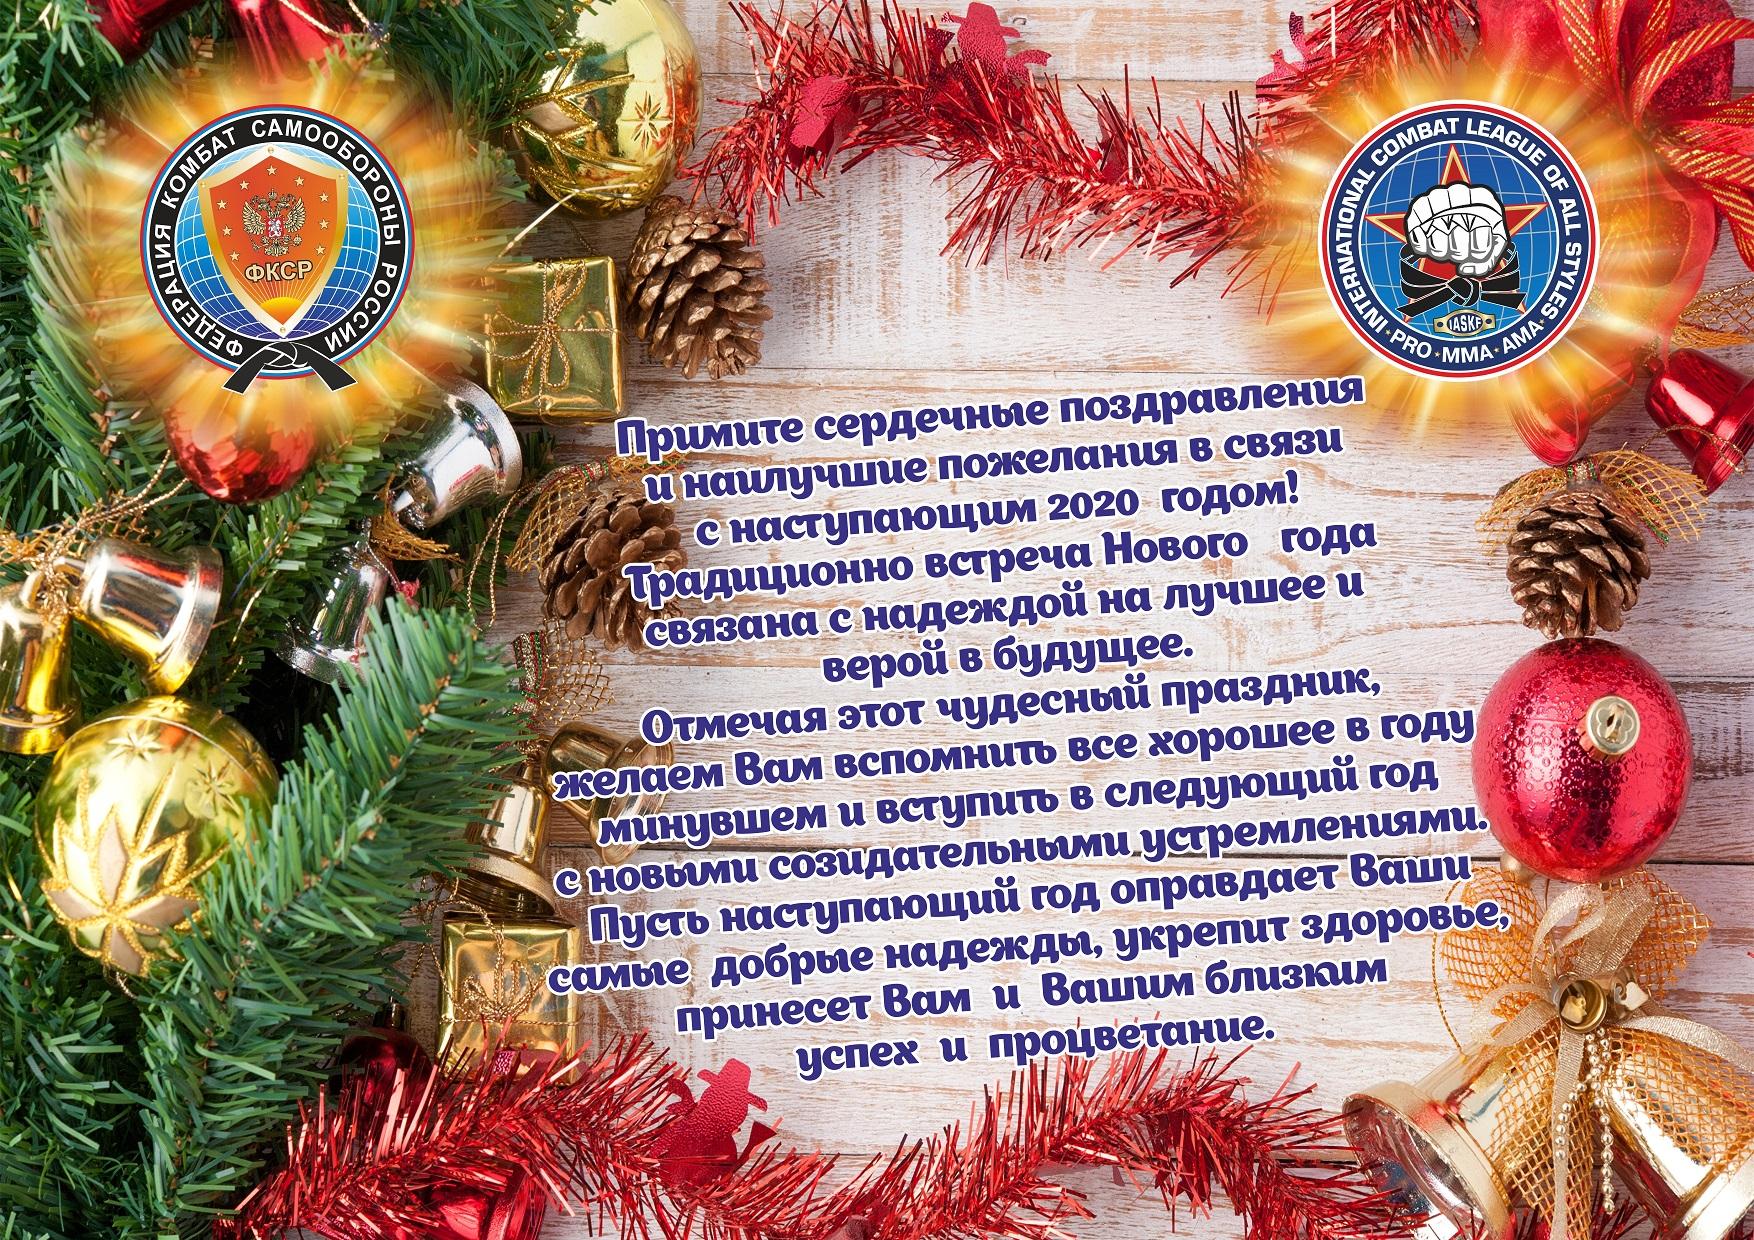 http://combatsd.ru/images/upload/Отктрытка_ФКСР1.jpg